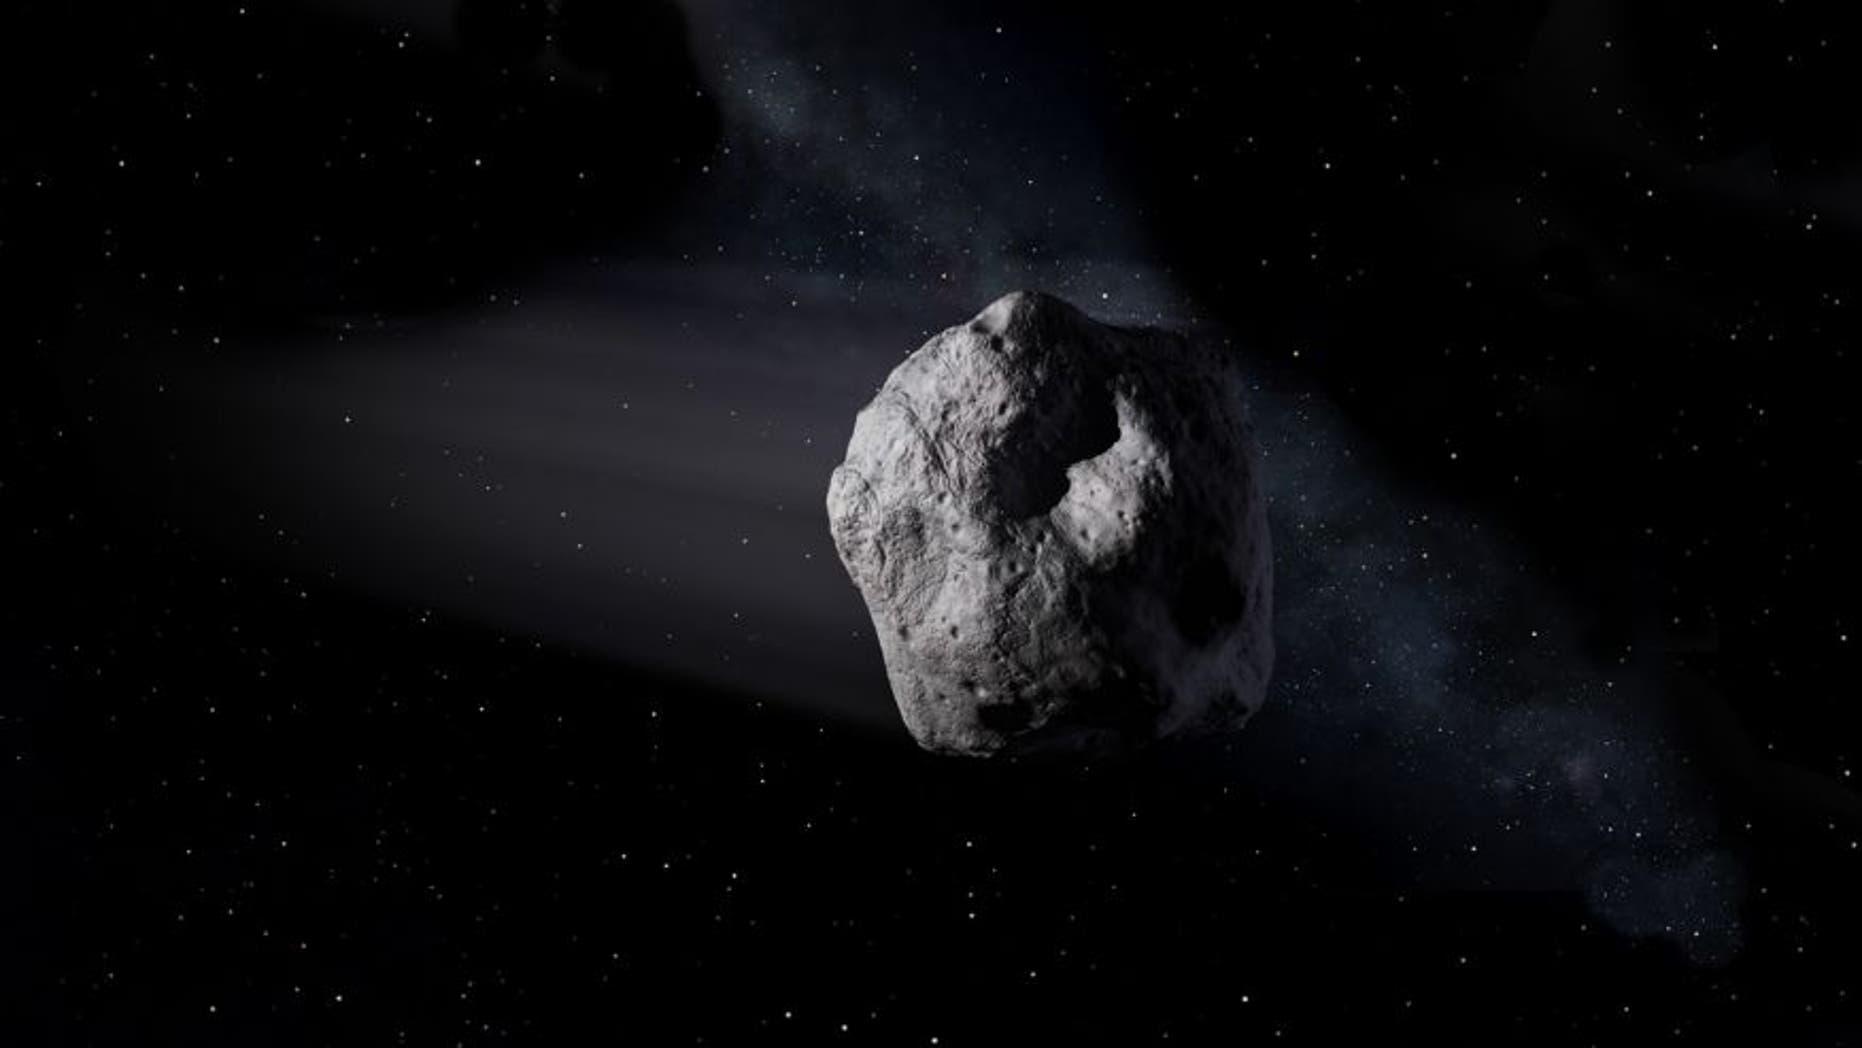 Artist's concept of a near-Earth object. Image credit: (NASA/JPL-Caltech)